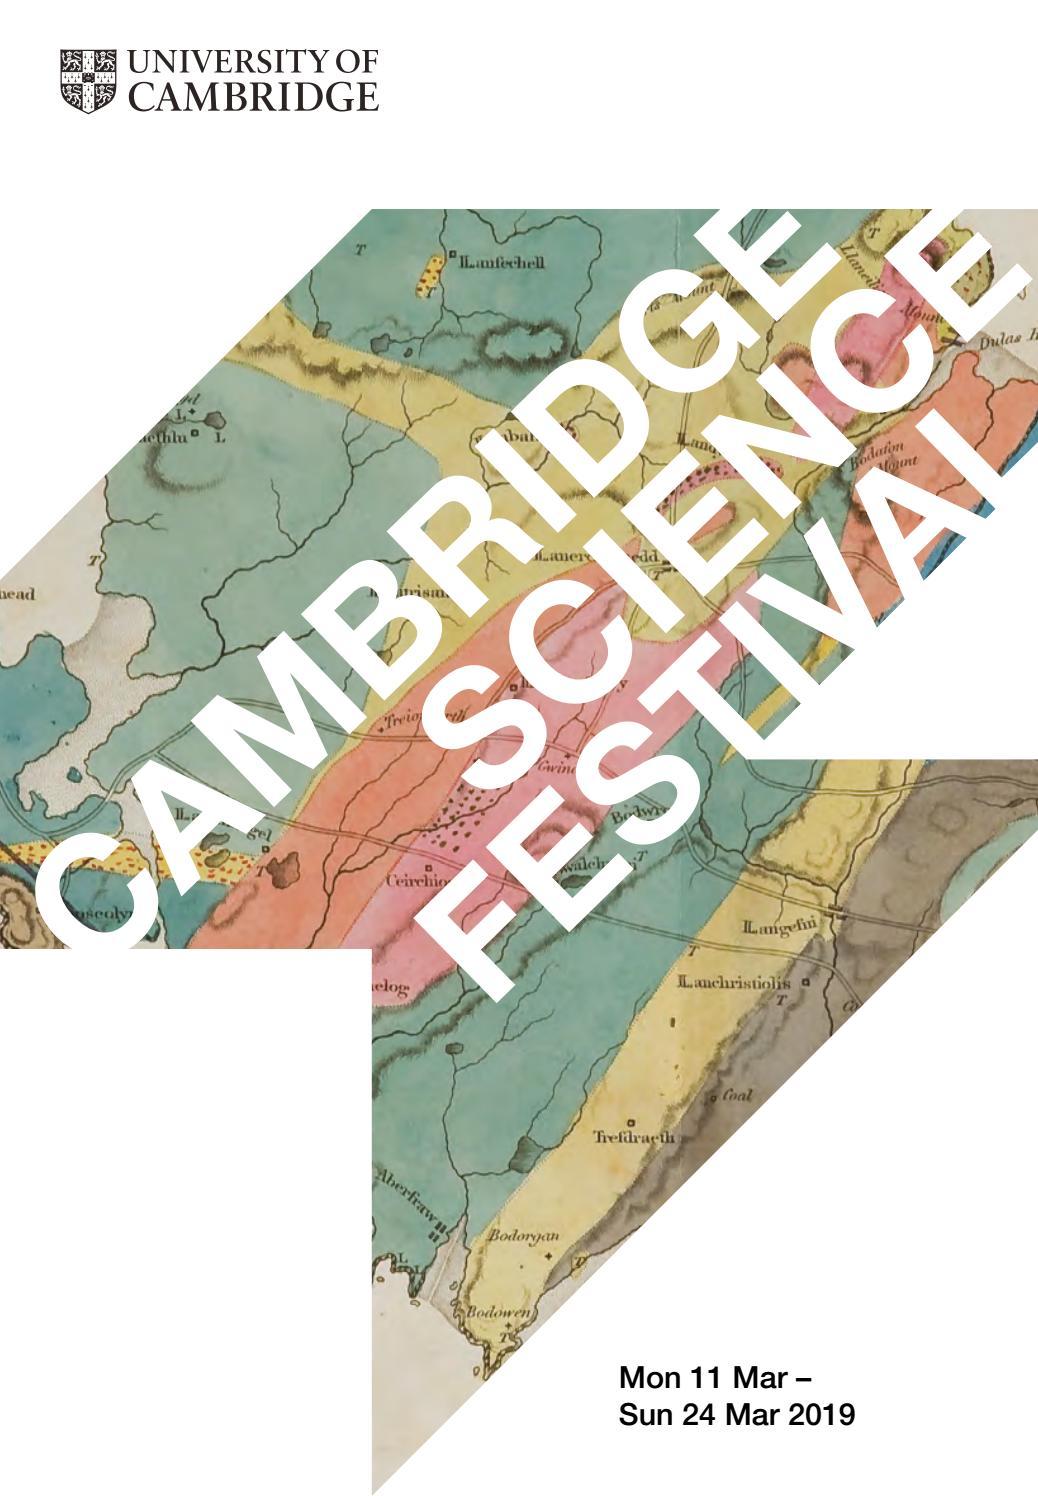 Cambridge Science Festival Programme 2019 by University of